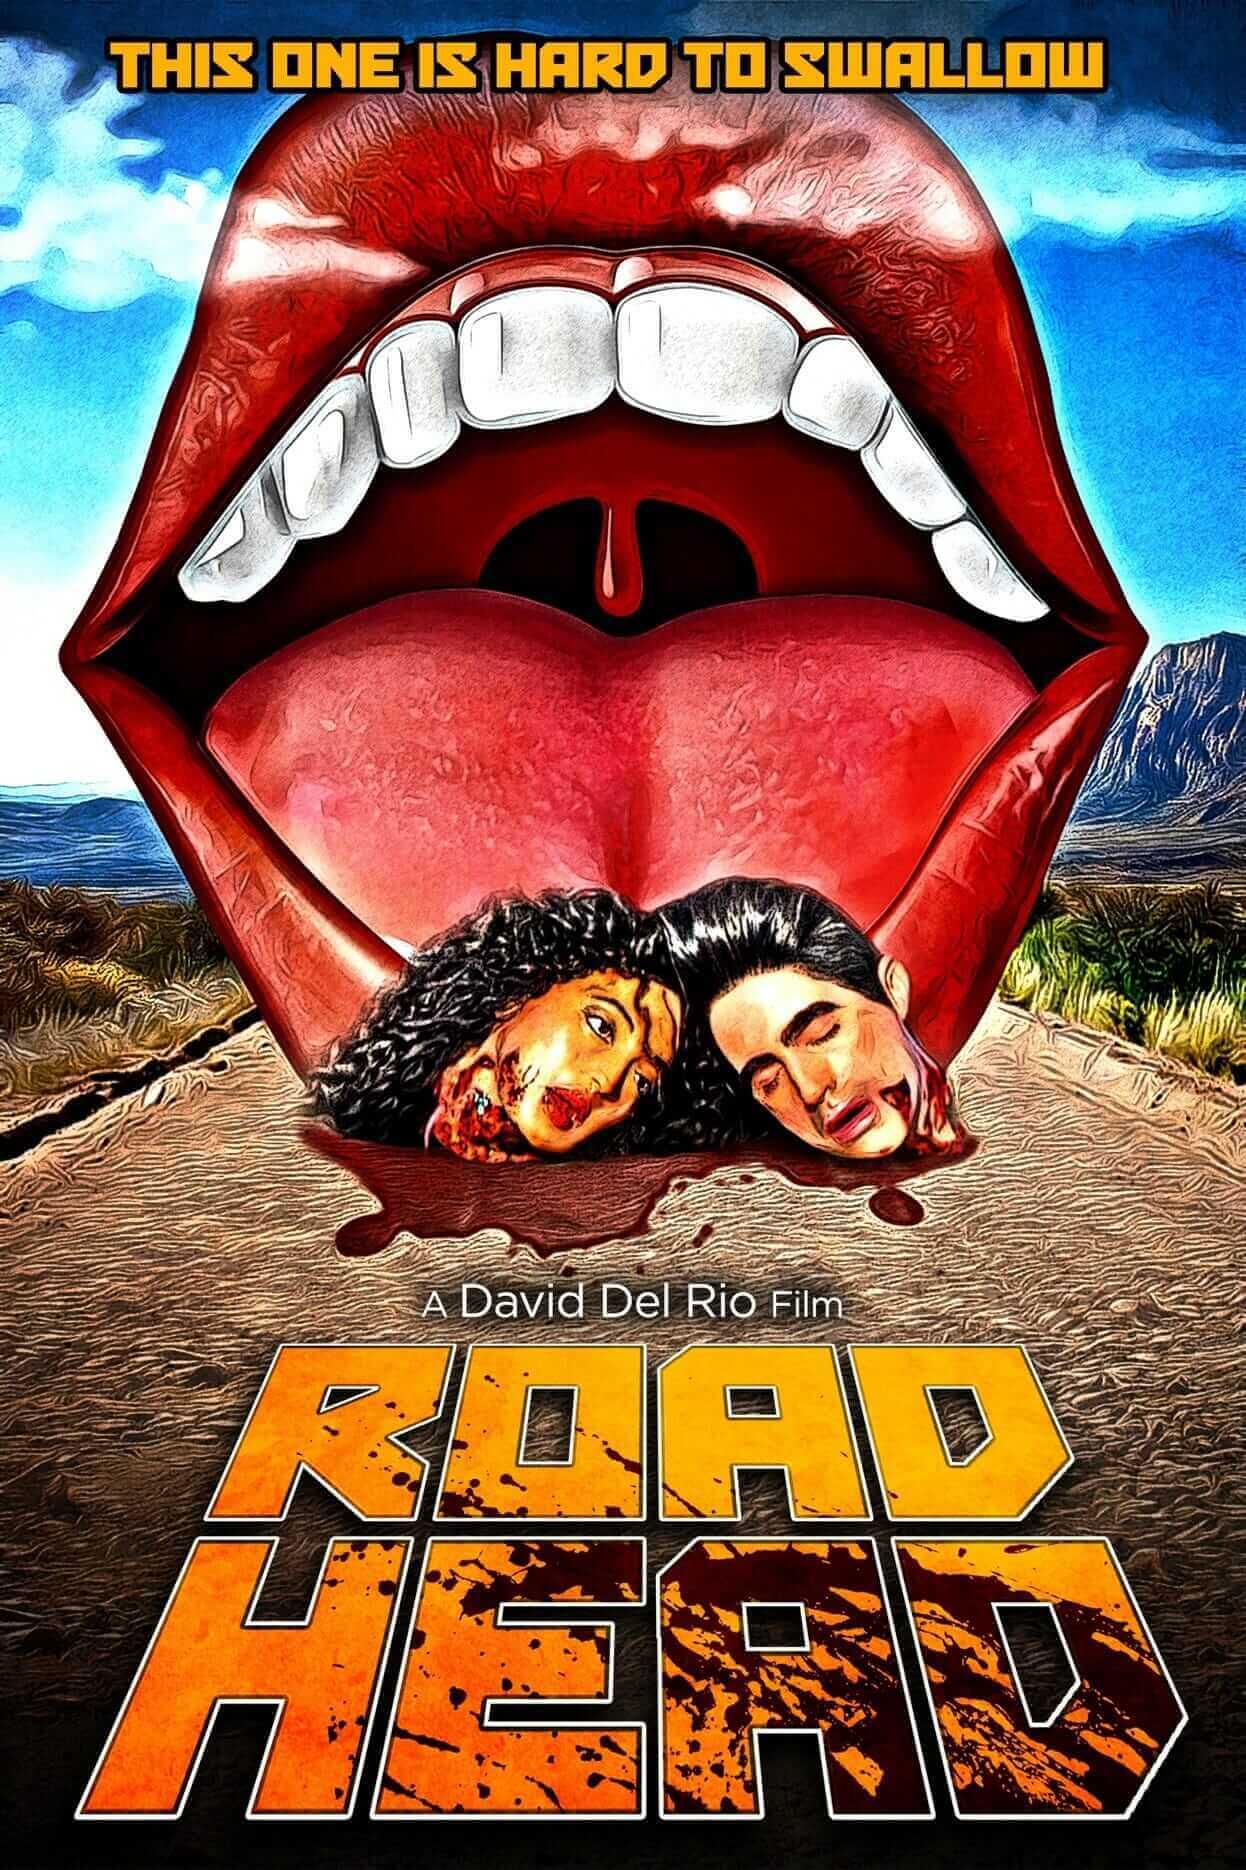 road head poster 2021